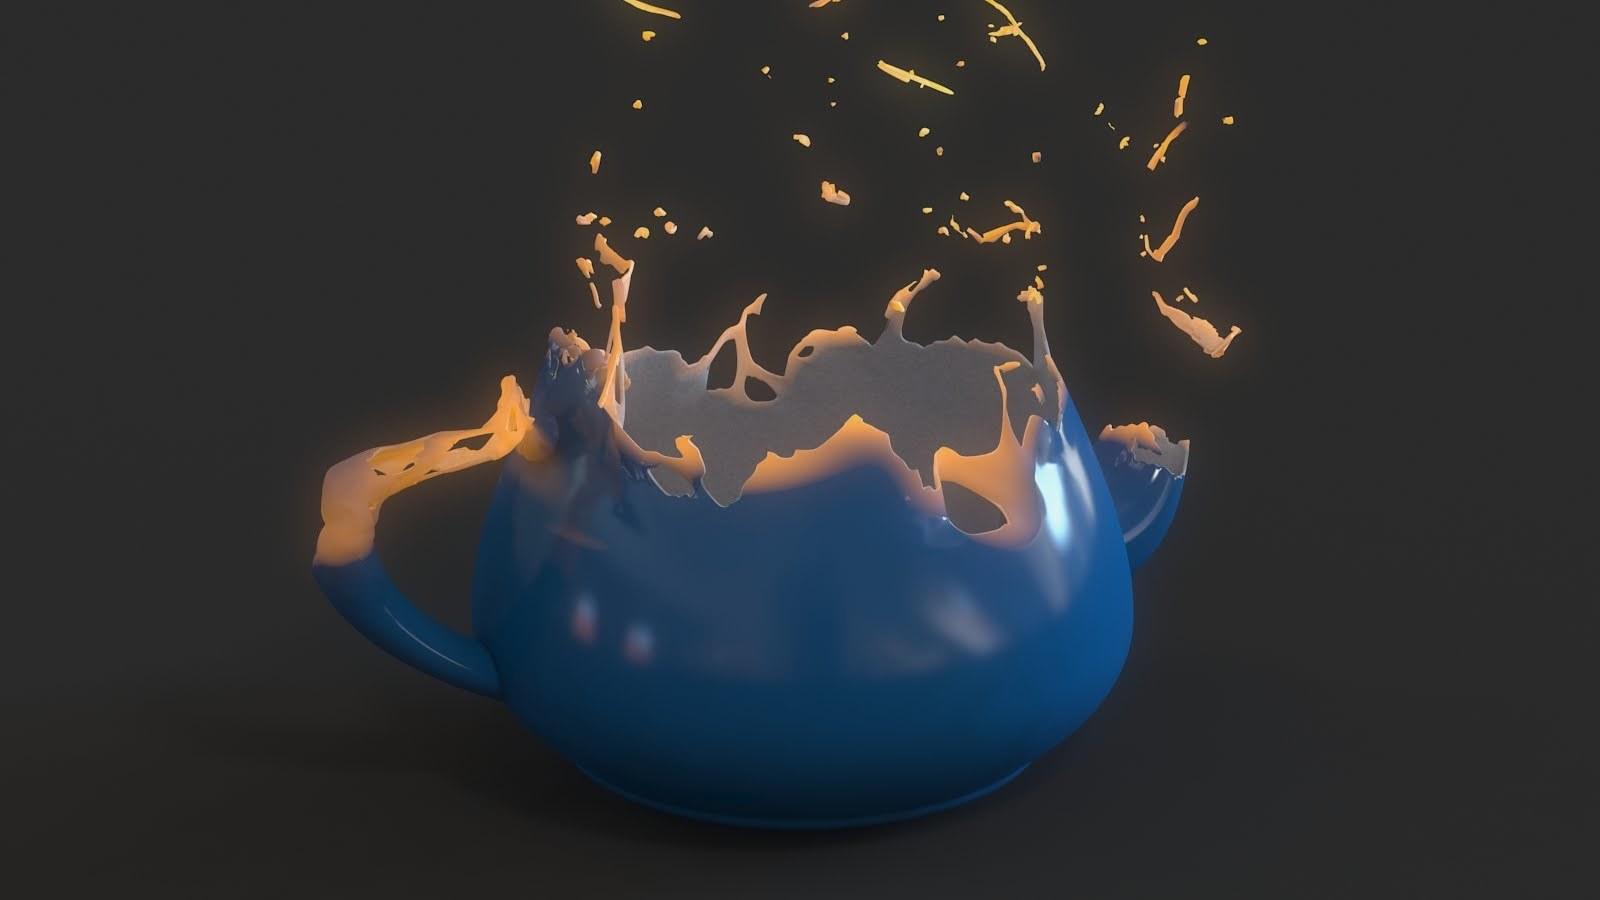 3dsMaxを使って溶解エフェクトを作成するチュートリアル!!